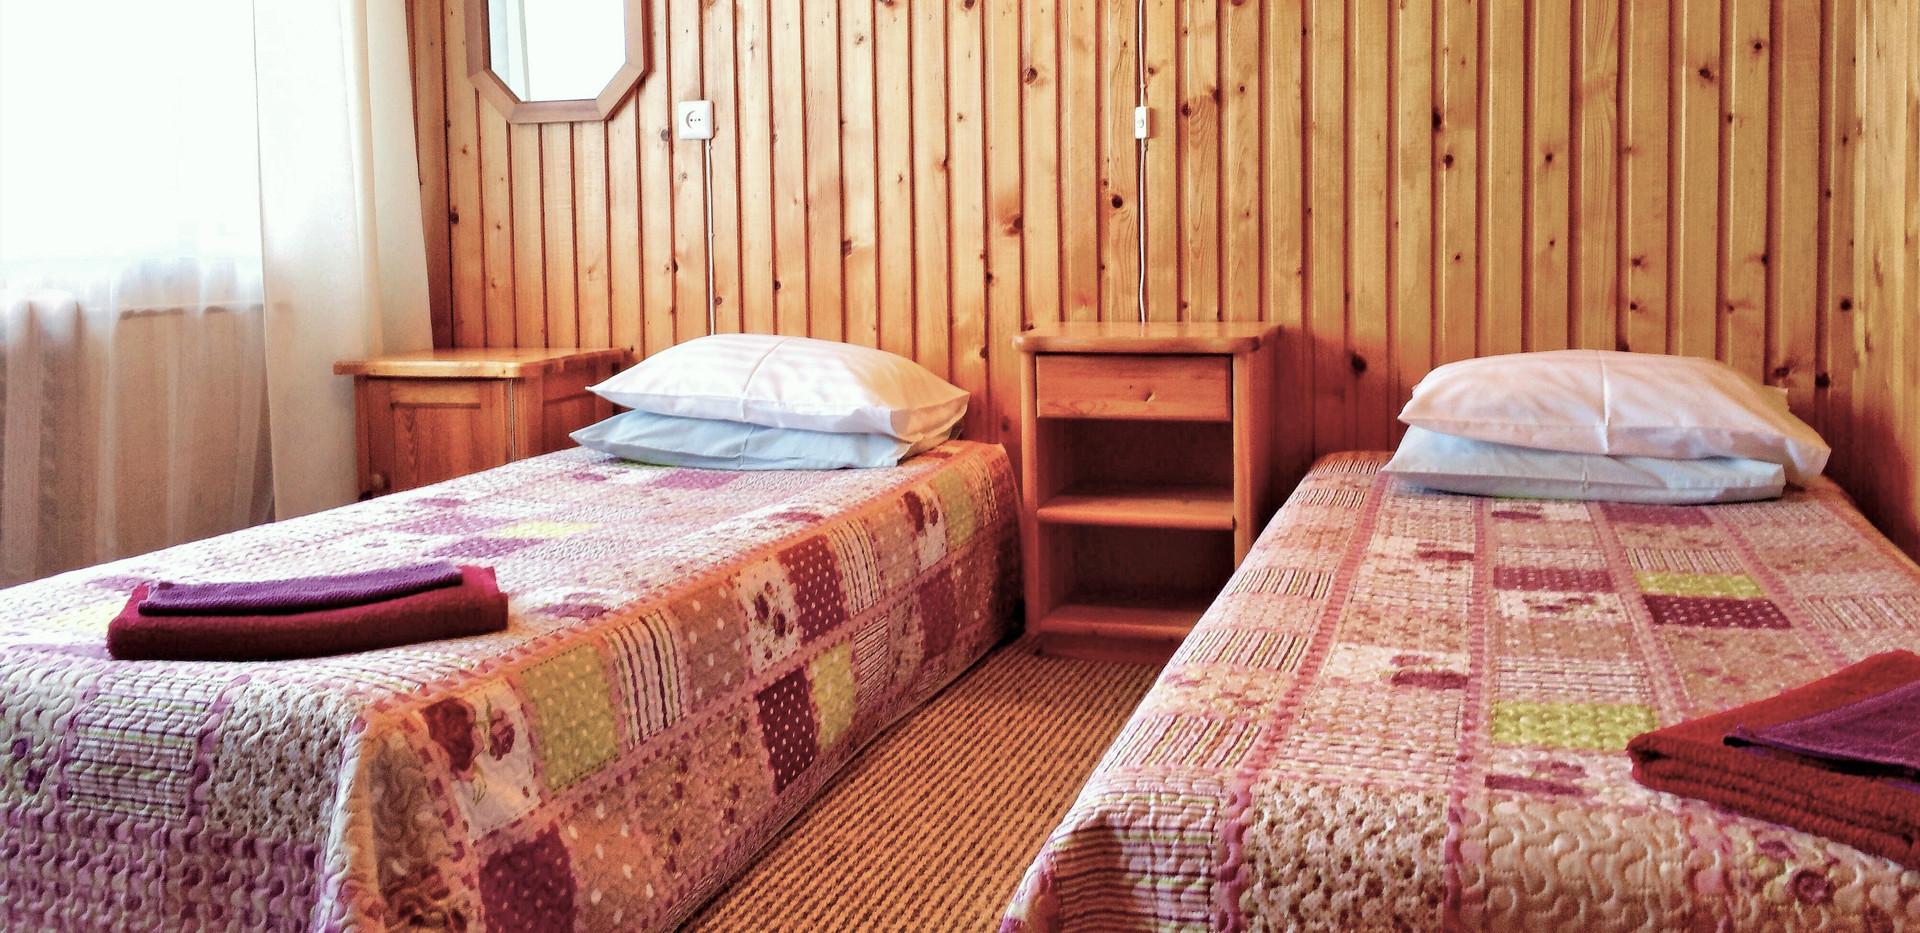 Tuba nr 6  - Külalistemaja Kikas